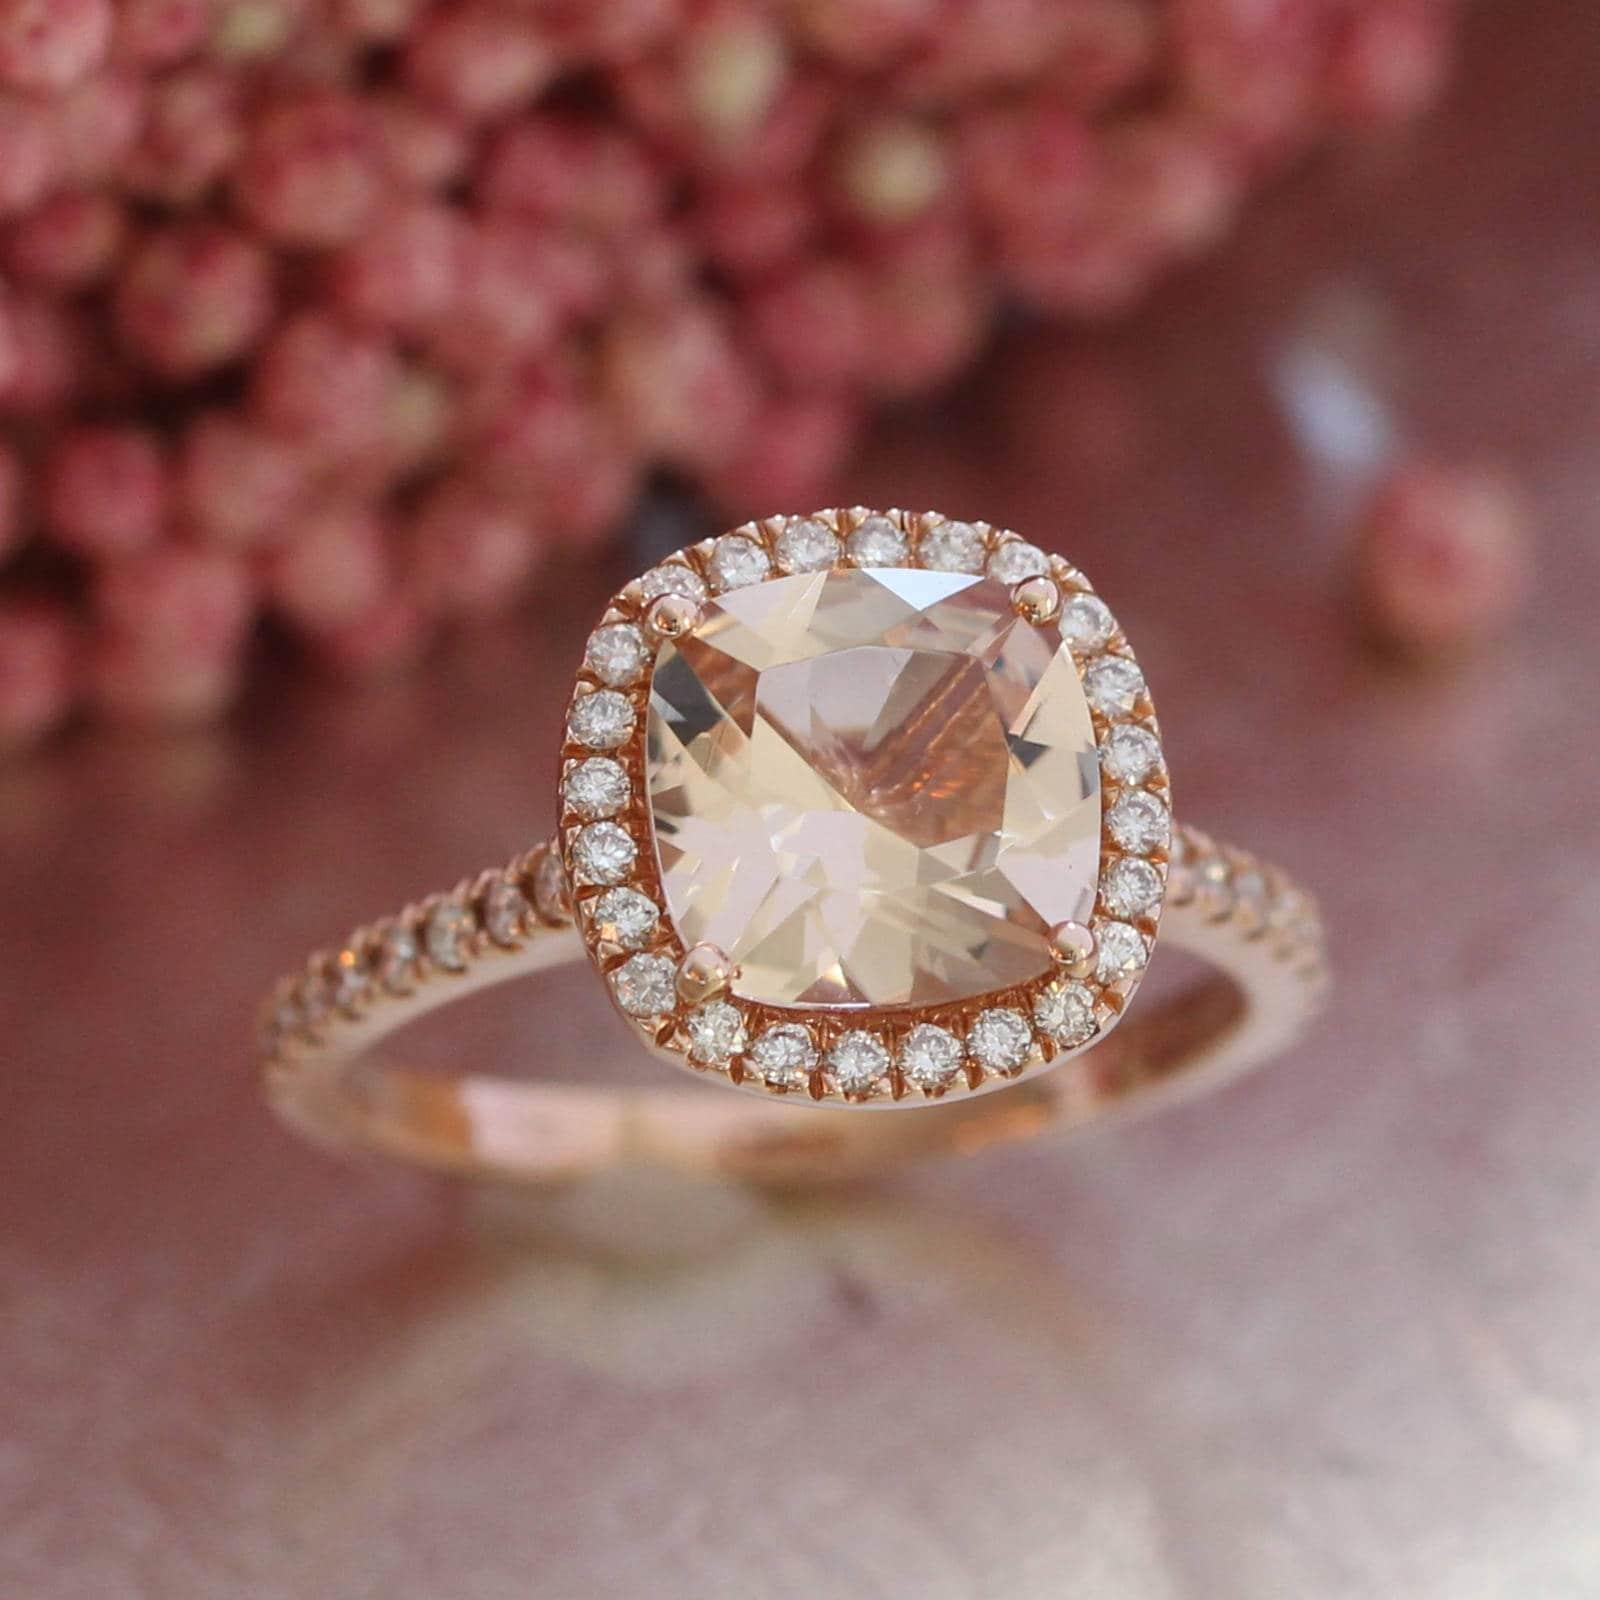 Wedding Star 6011 Toasting Flutes  Rose Gold Diamond Glitter